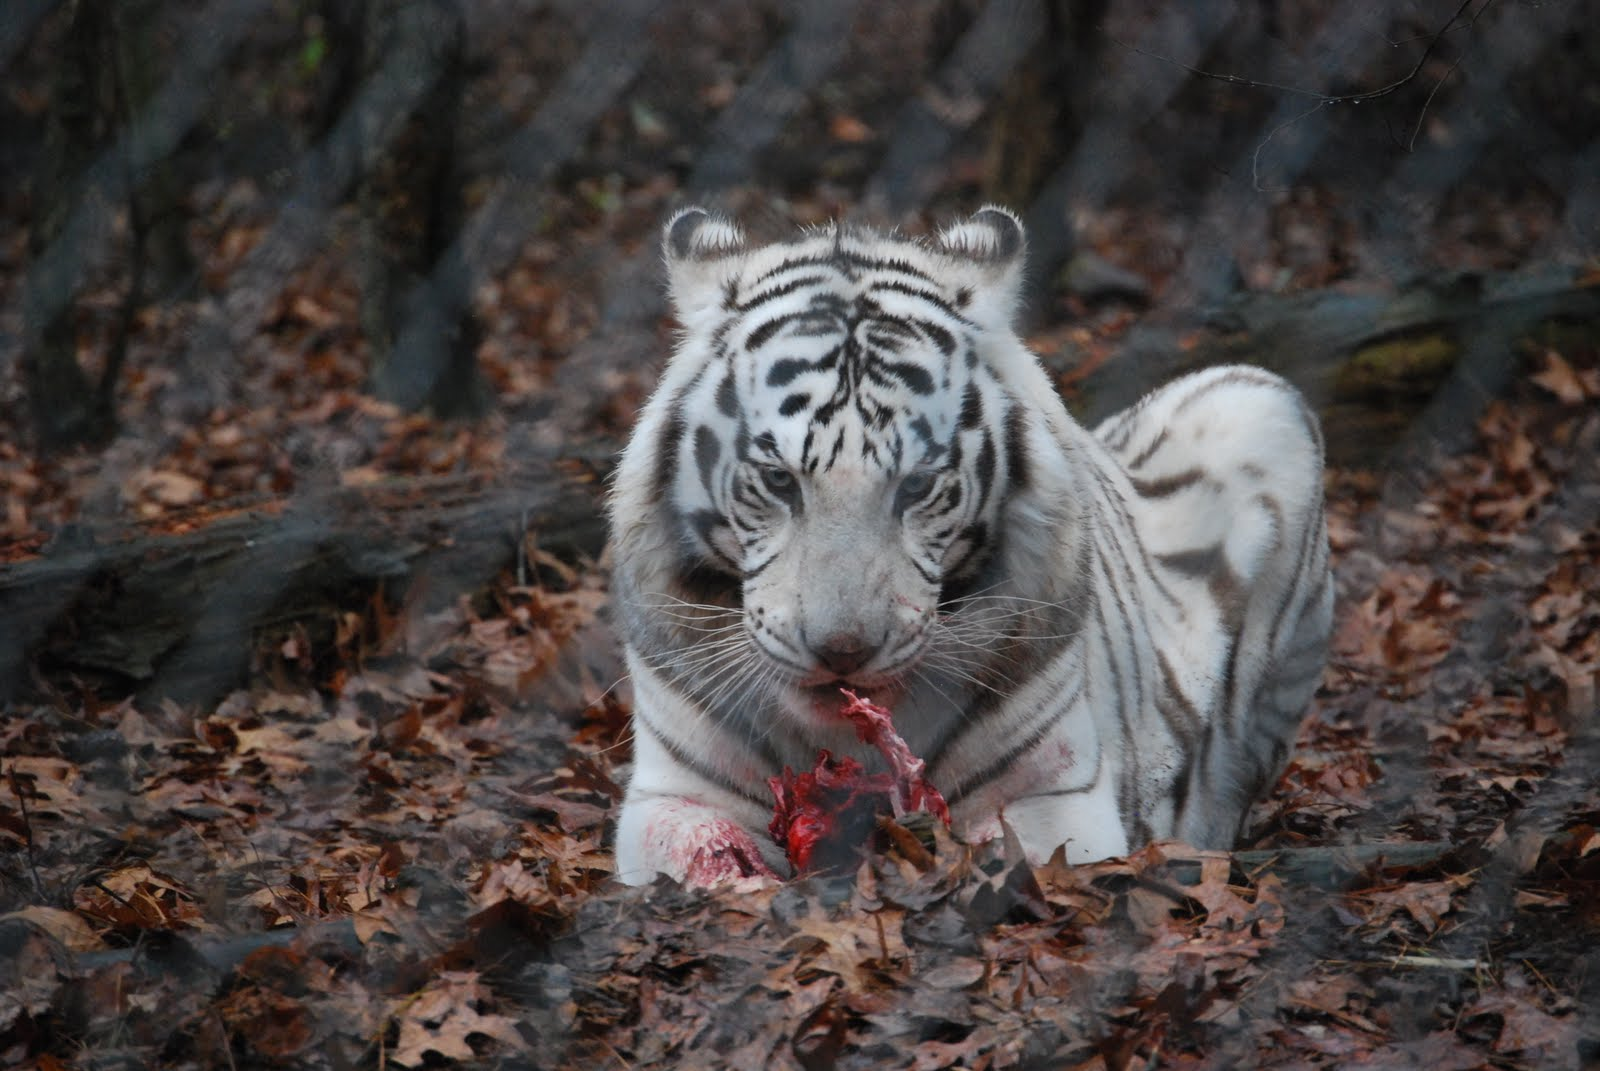 tiger wallpaper widescreen - photo #31